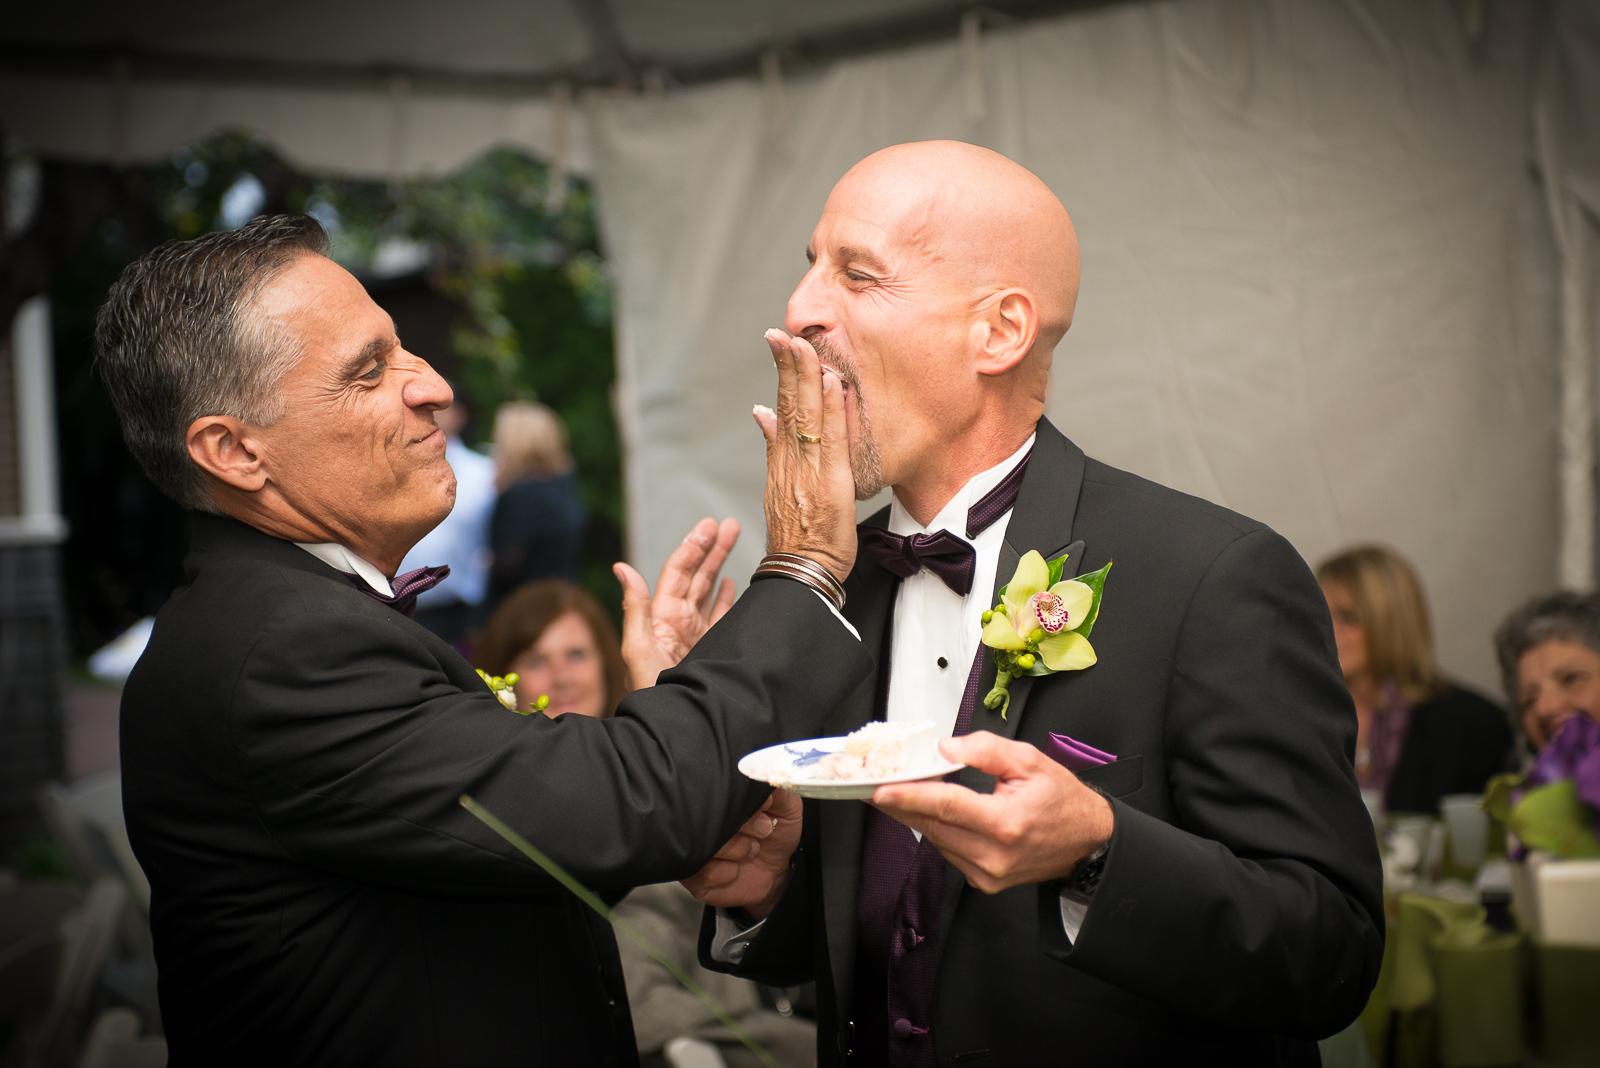 Michael-Napier-Weddings-Ludwig-Guilbeau Wedding-20 (39).jpg